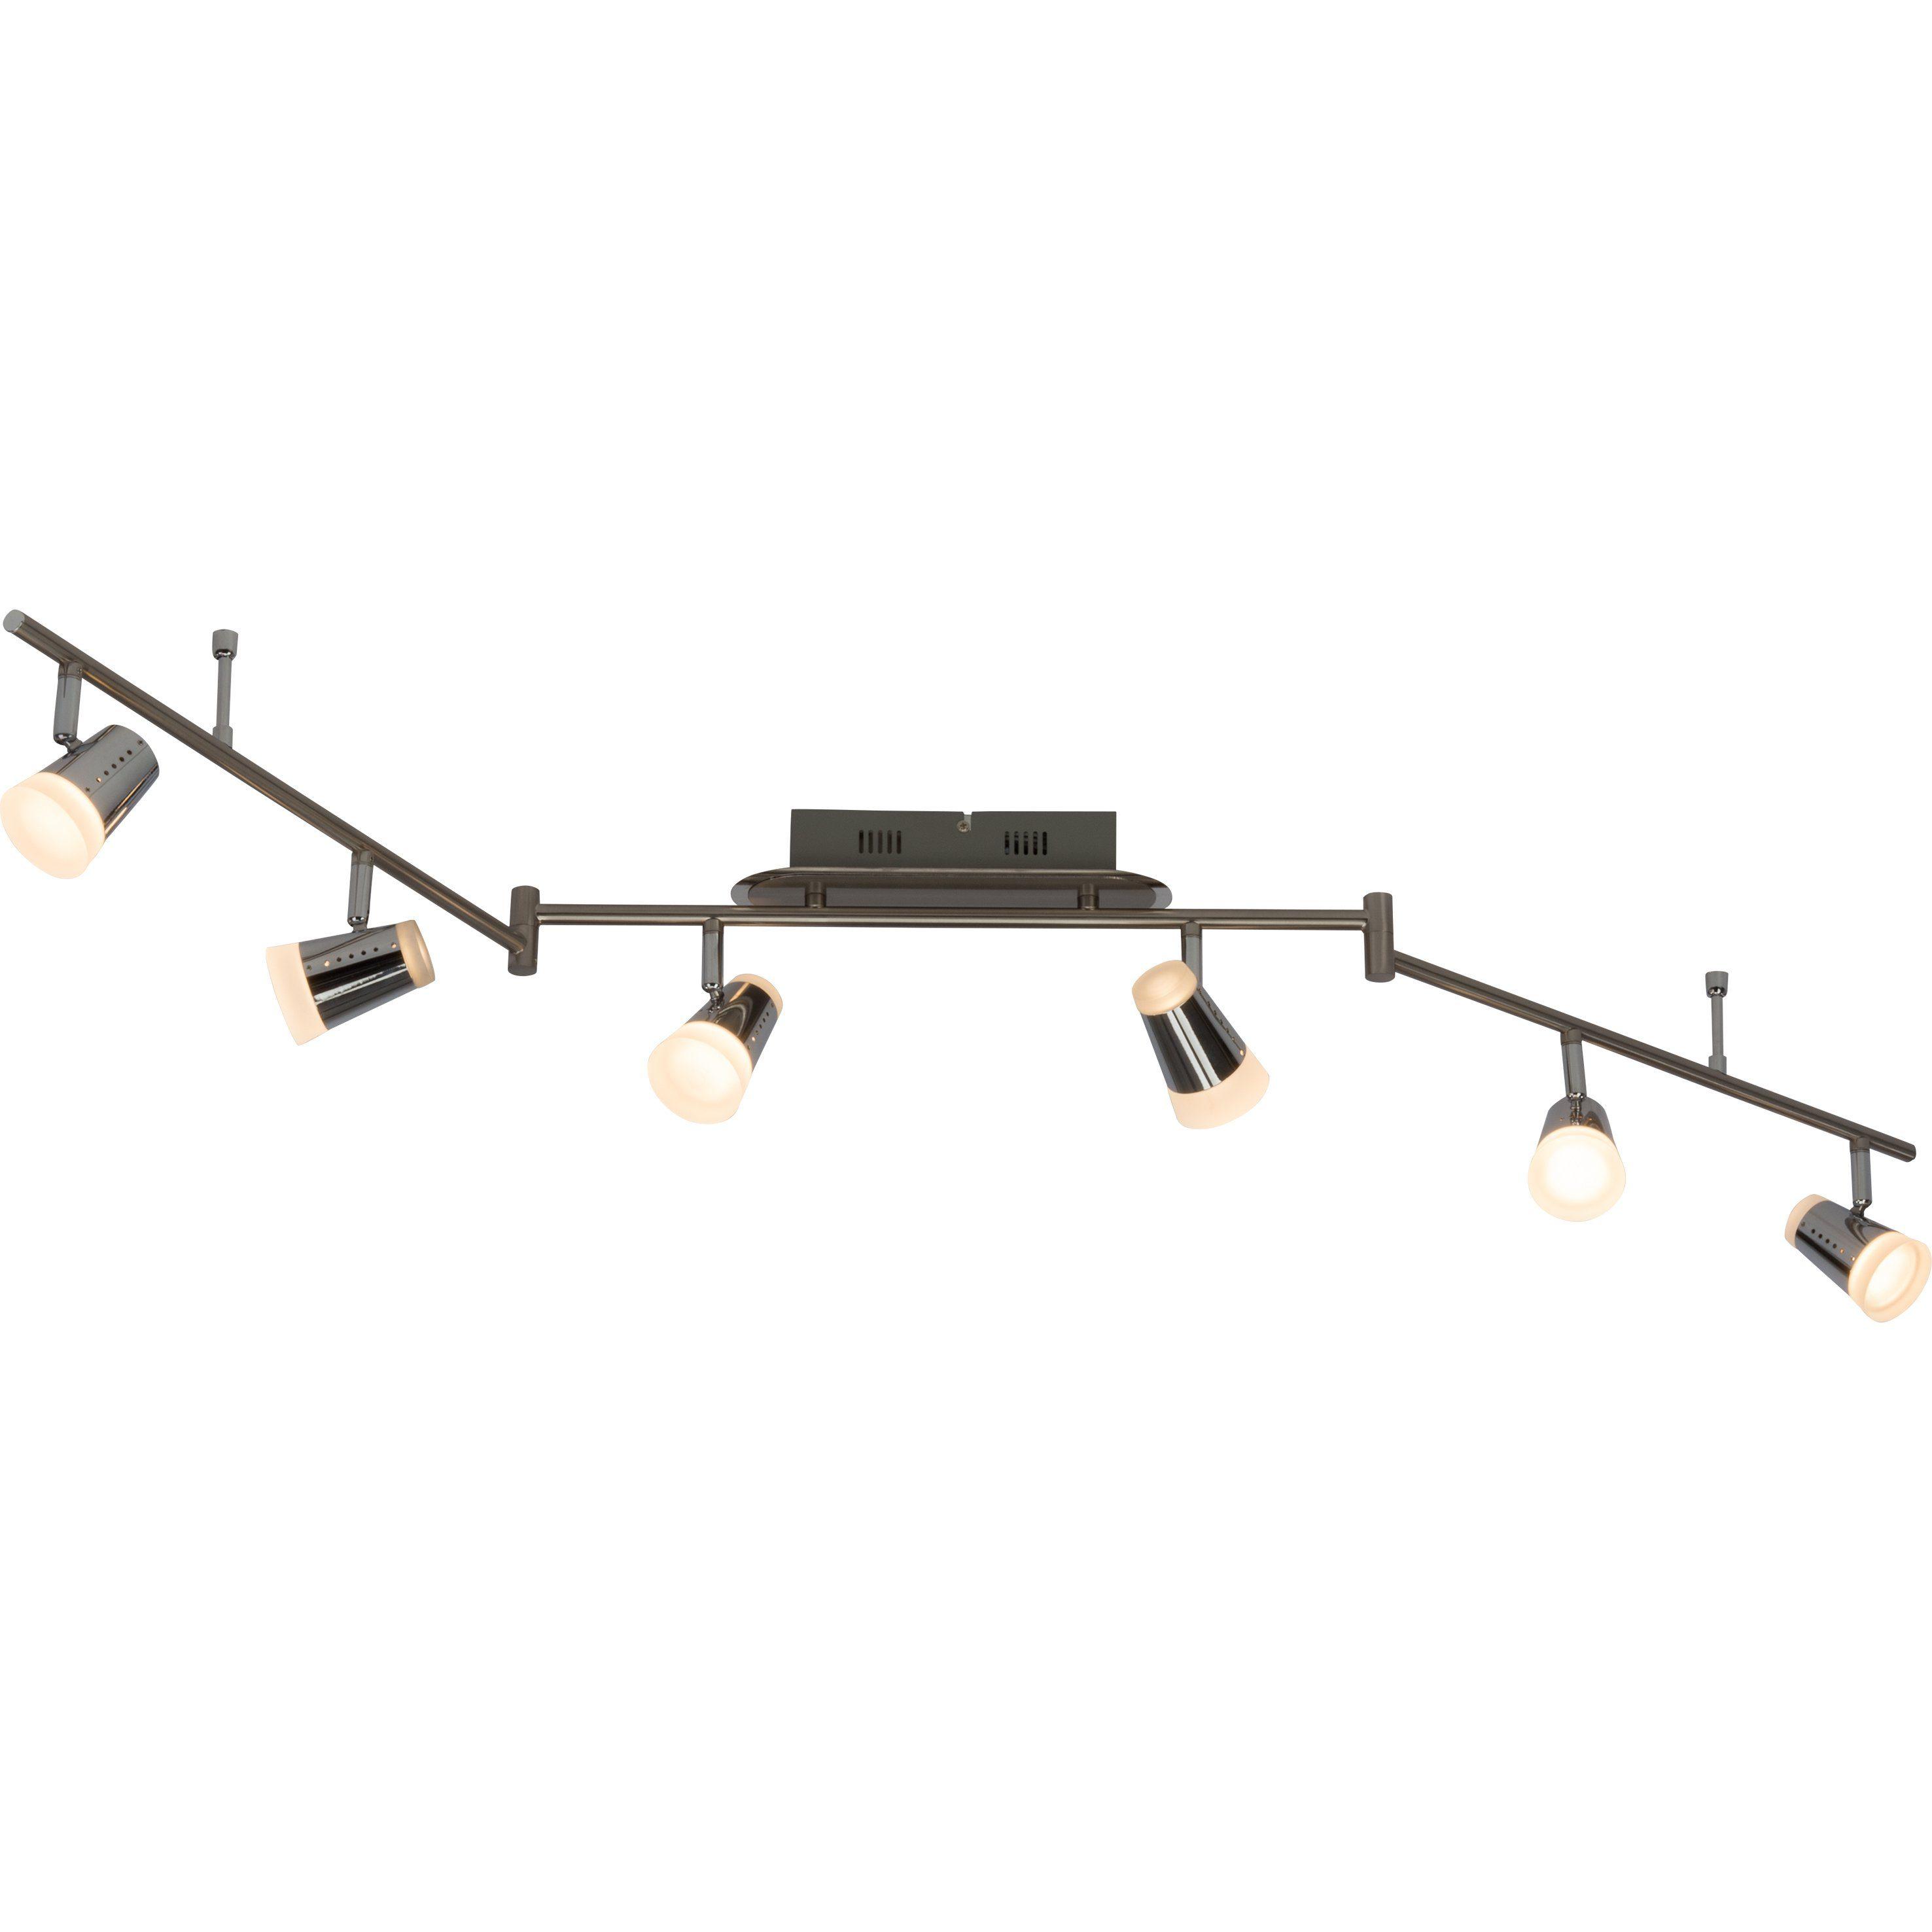 Brilliant Leuchten Stairs LED Spotbogen, 6-flammig (Z-Form) eisen/chrom